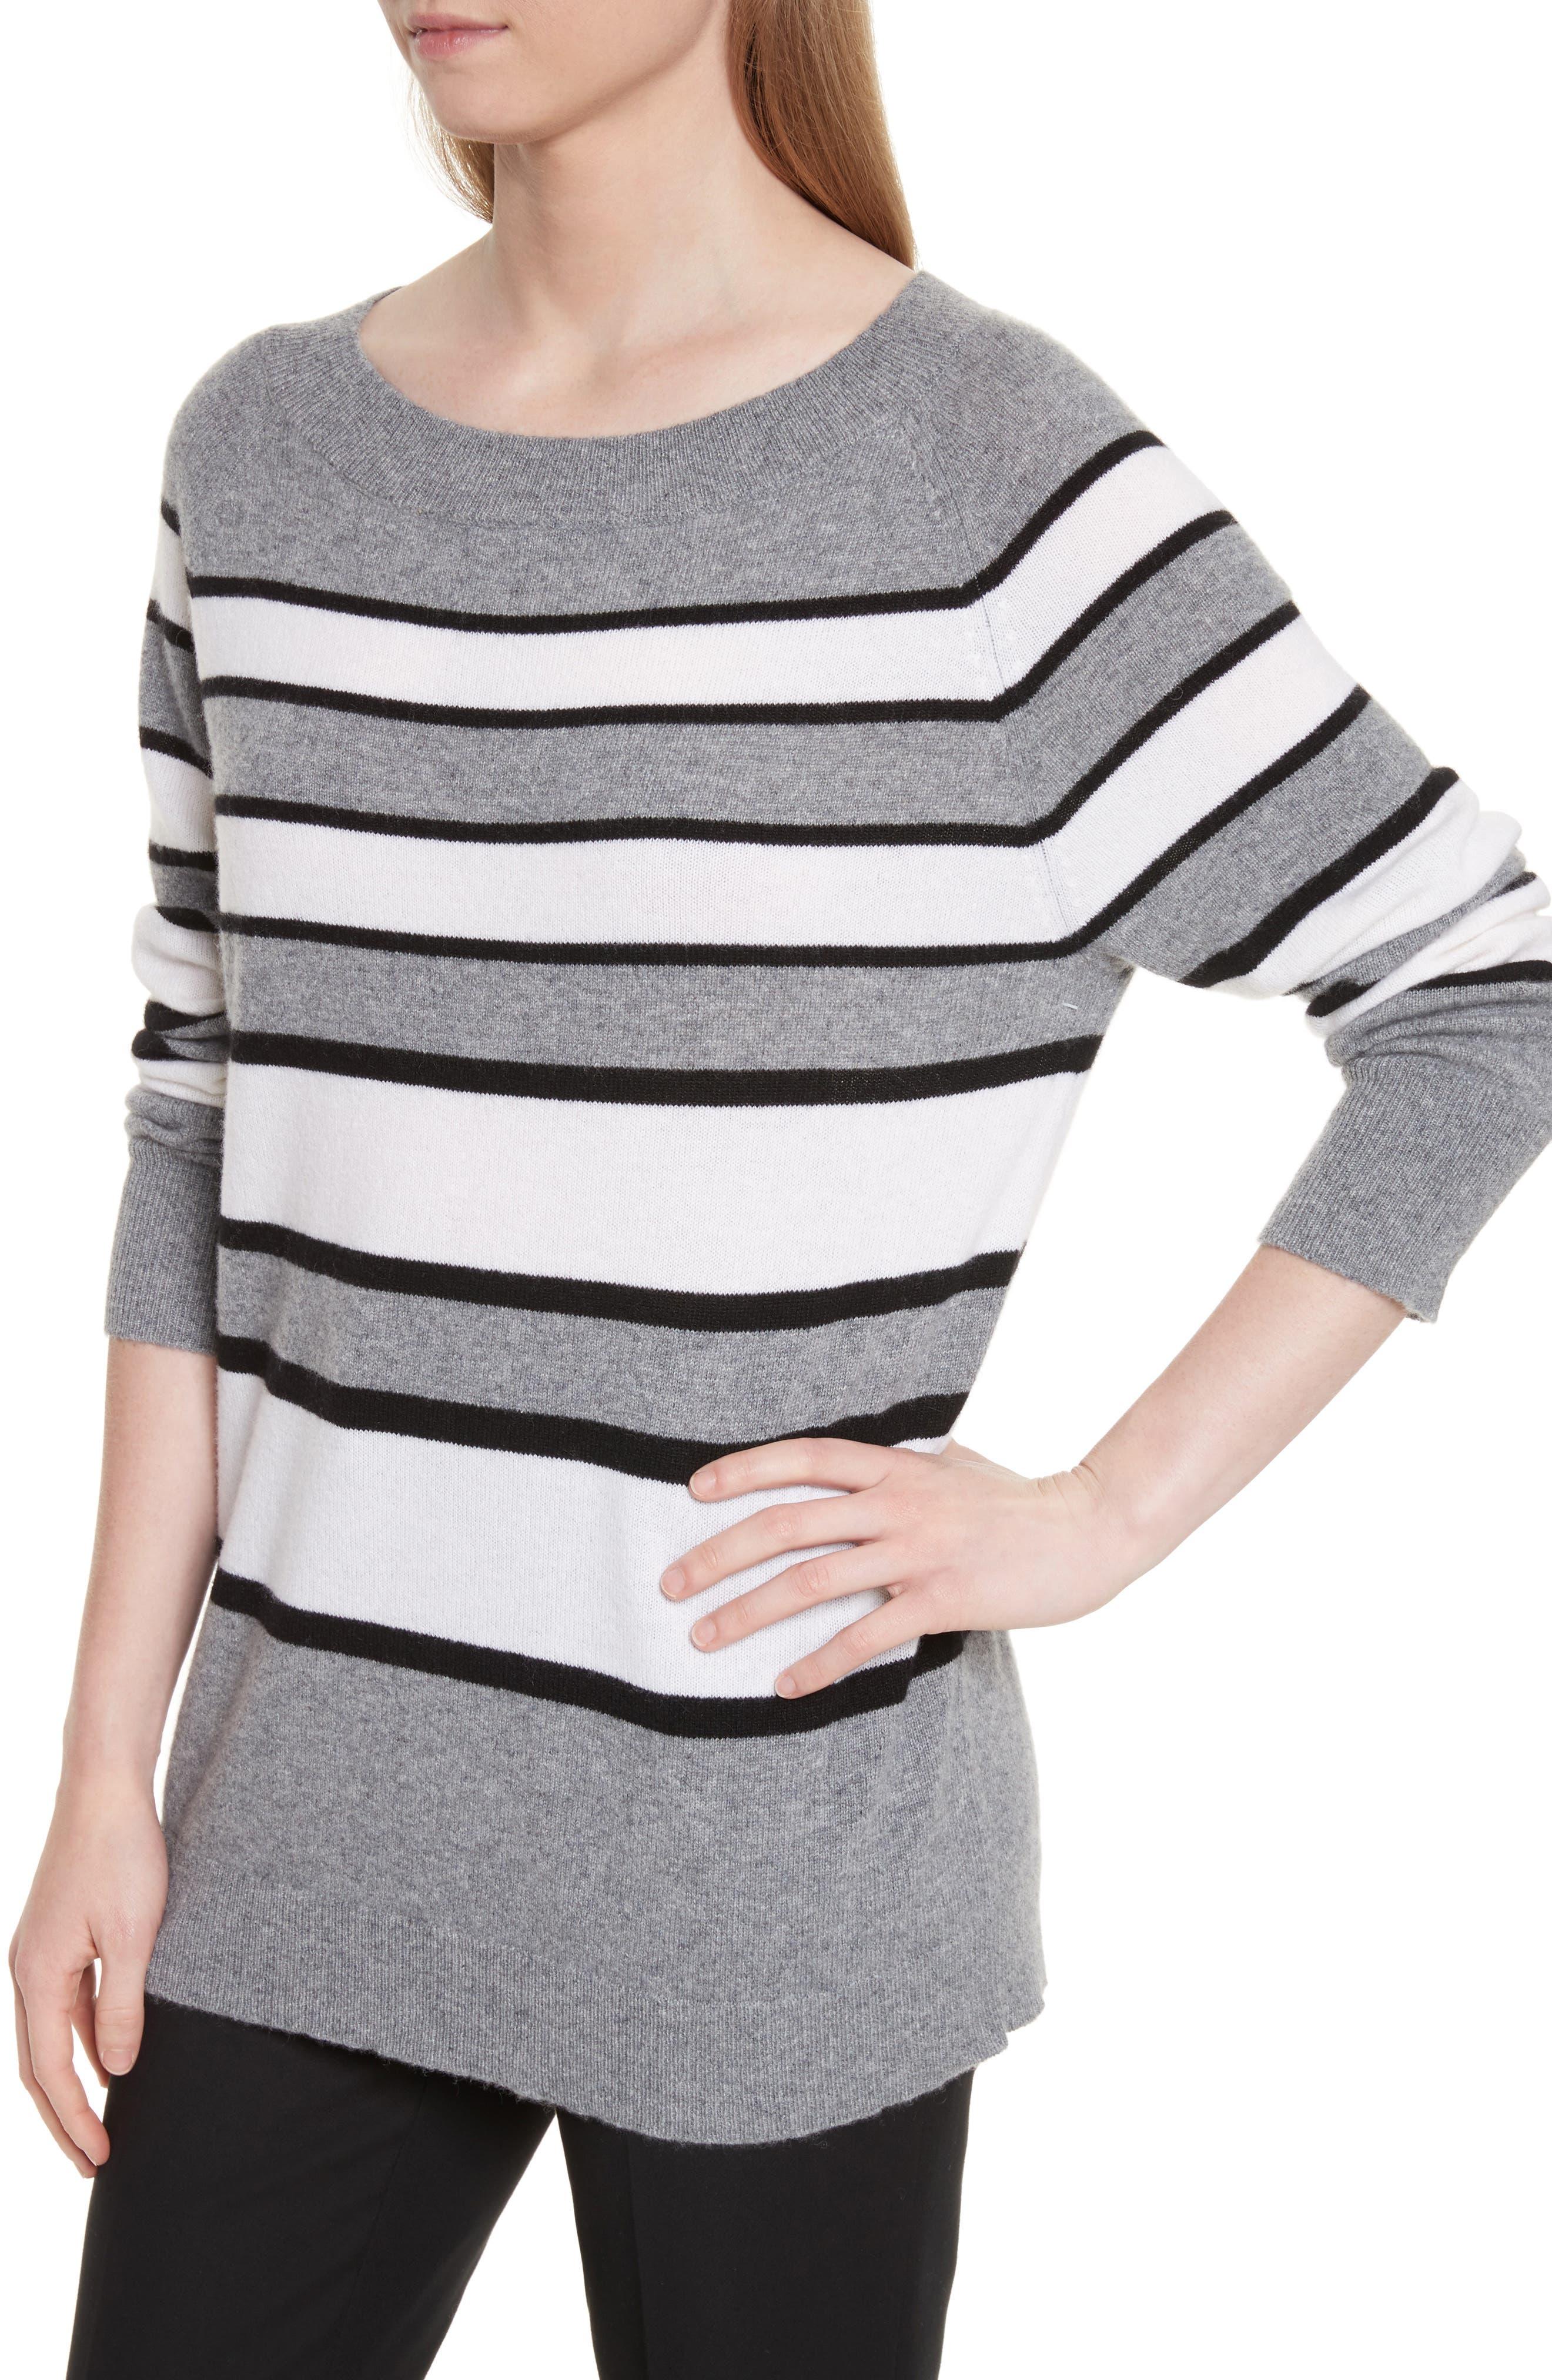 Cody Stripe Cashmere Boat Neck Sweater,                             Alternate thumbnail 4, color,                             Heather Grey Multi